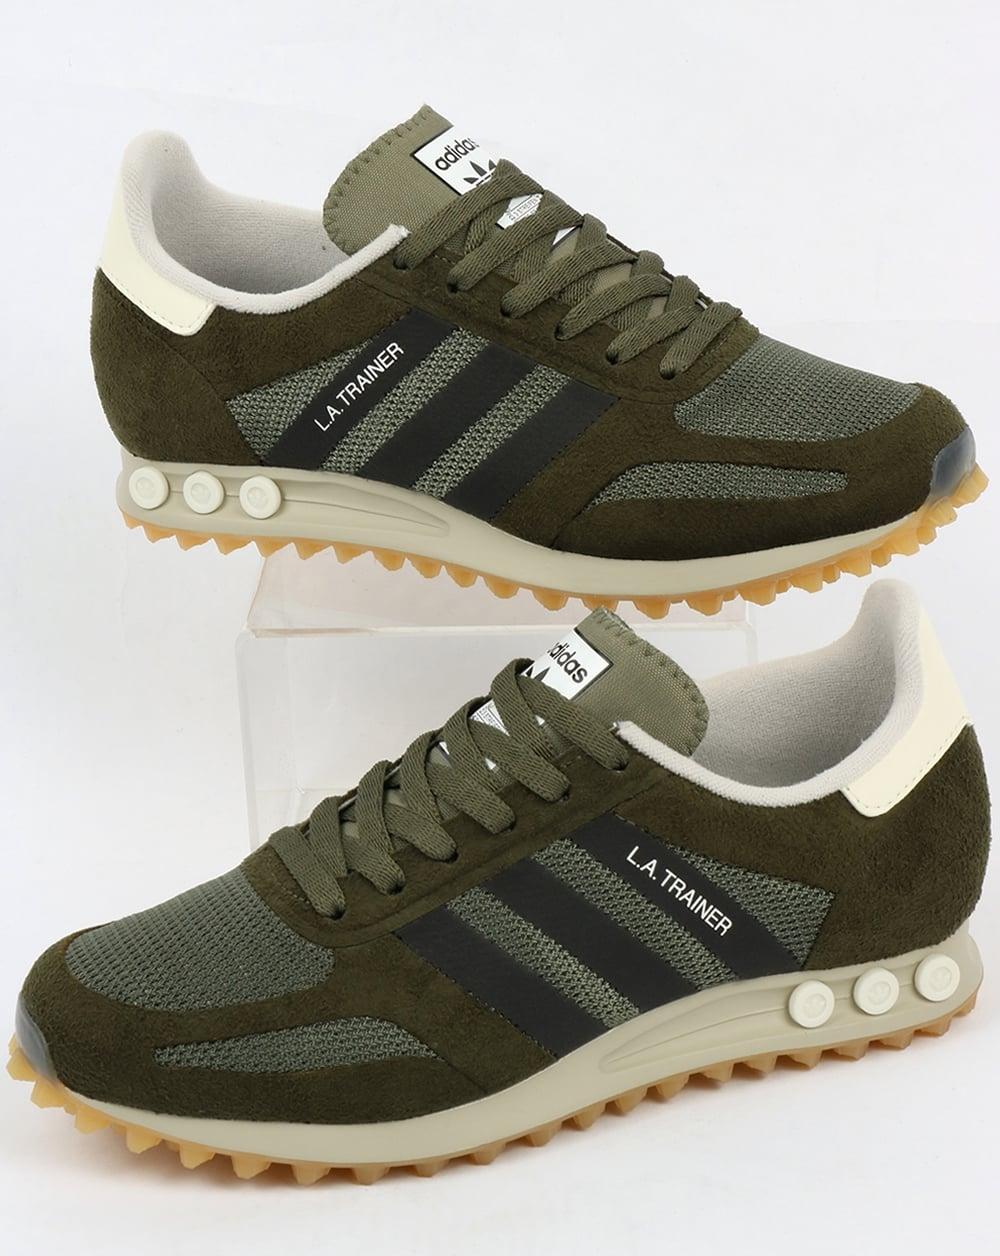 adidas la trainers mens uk